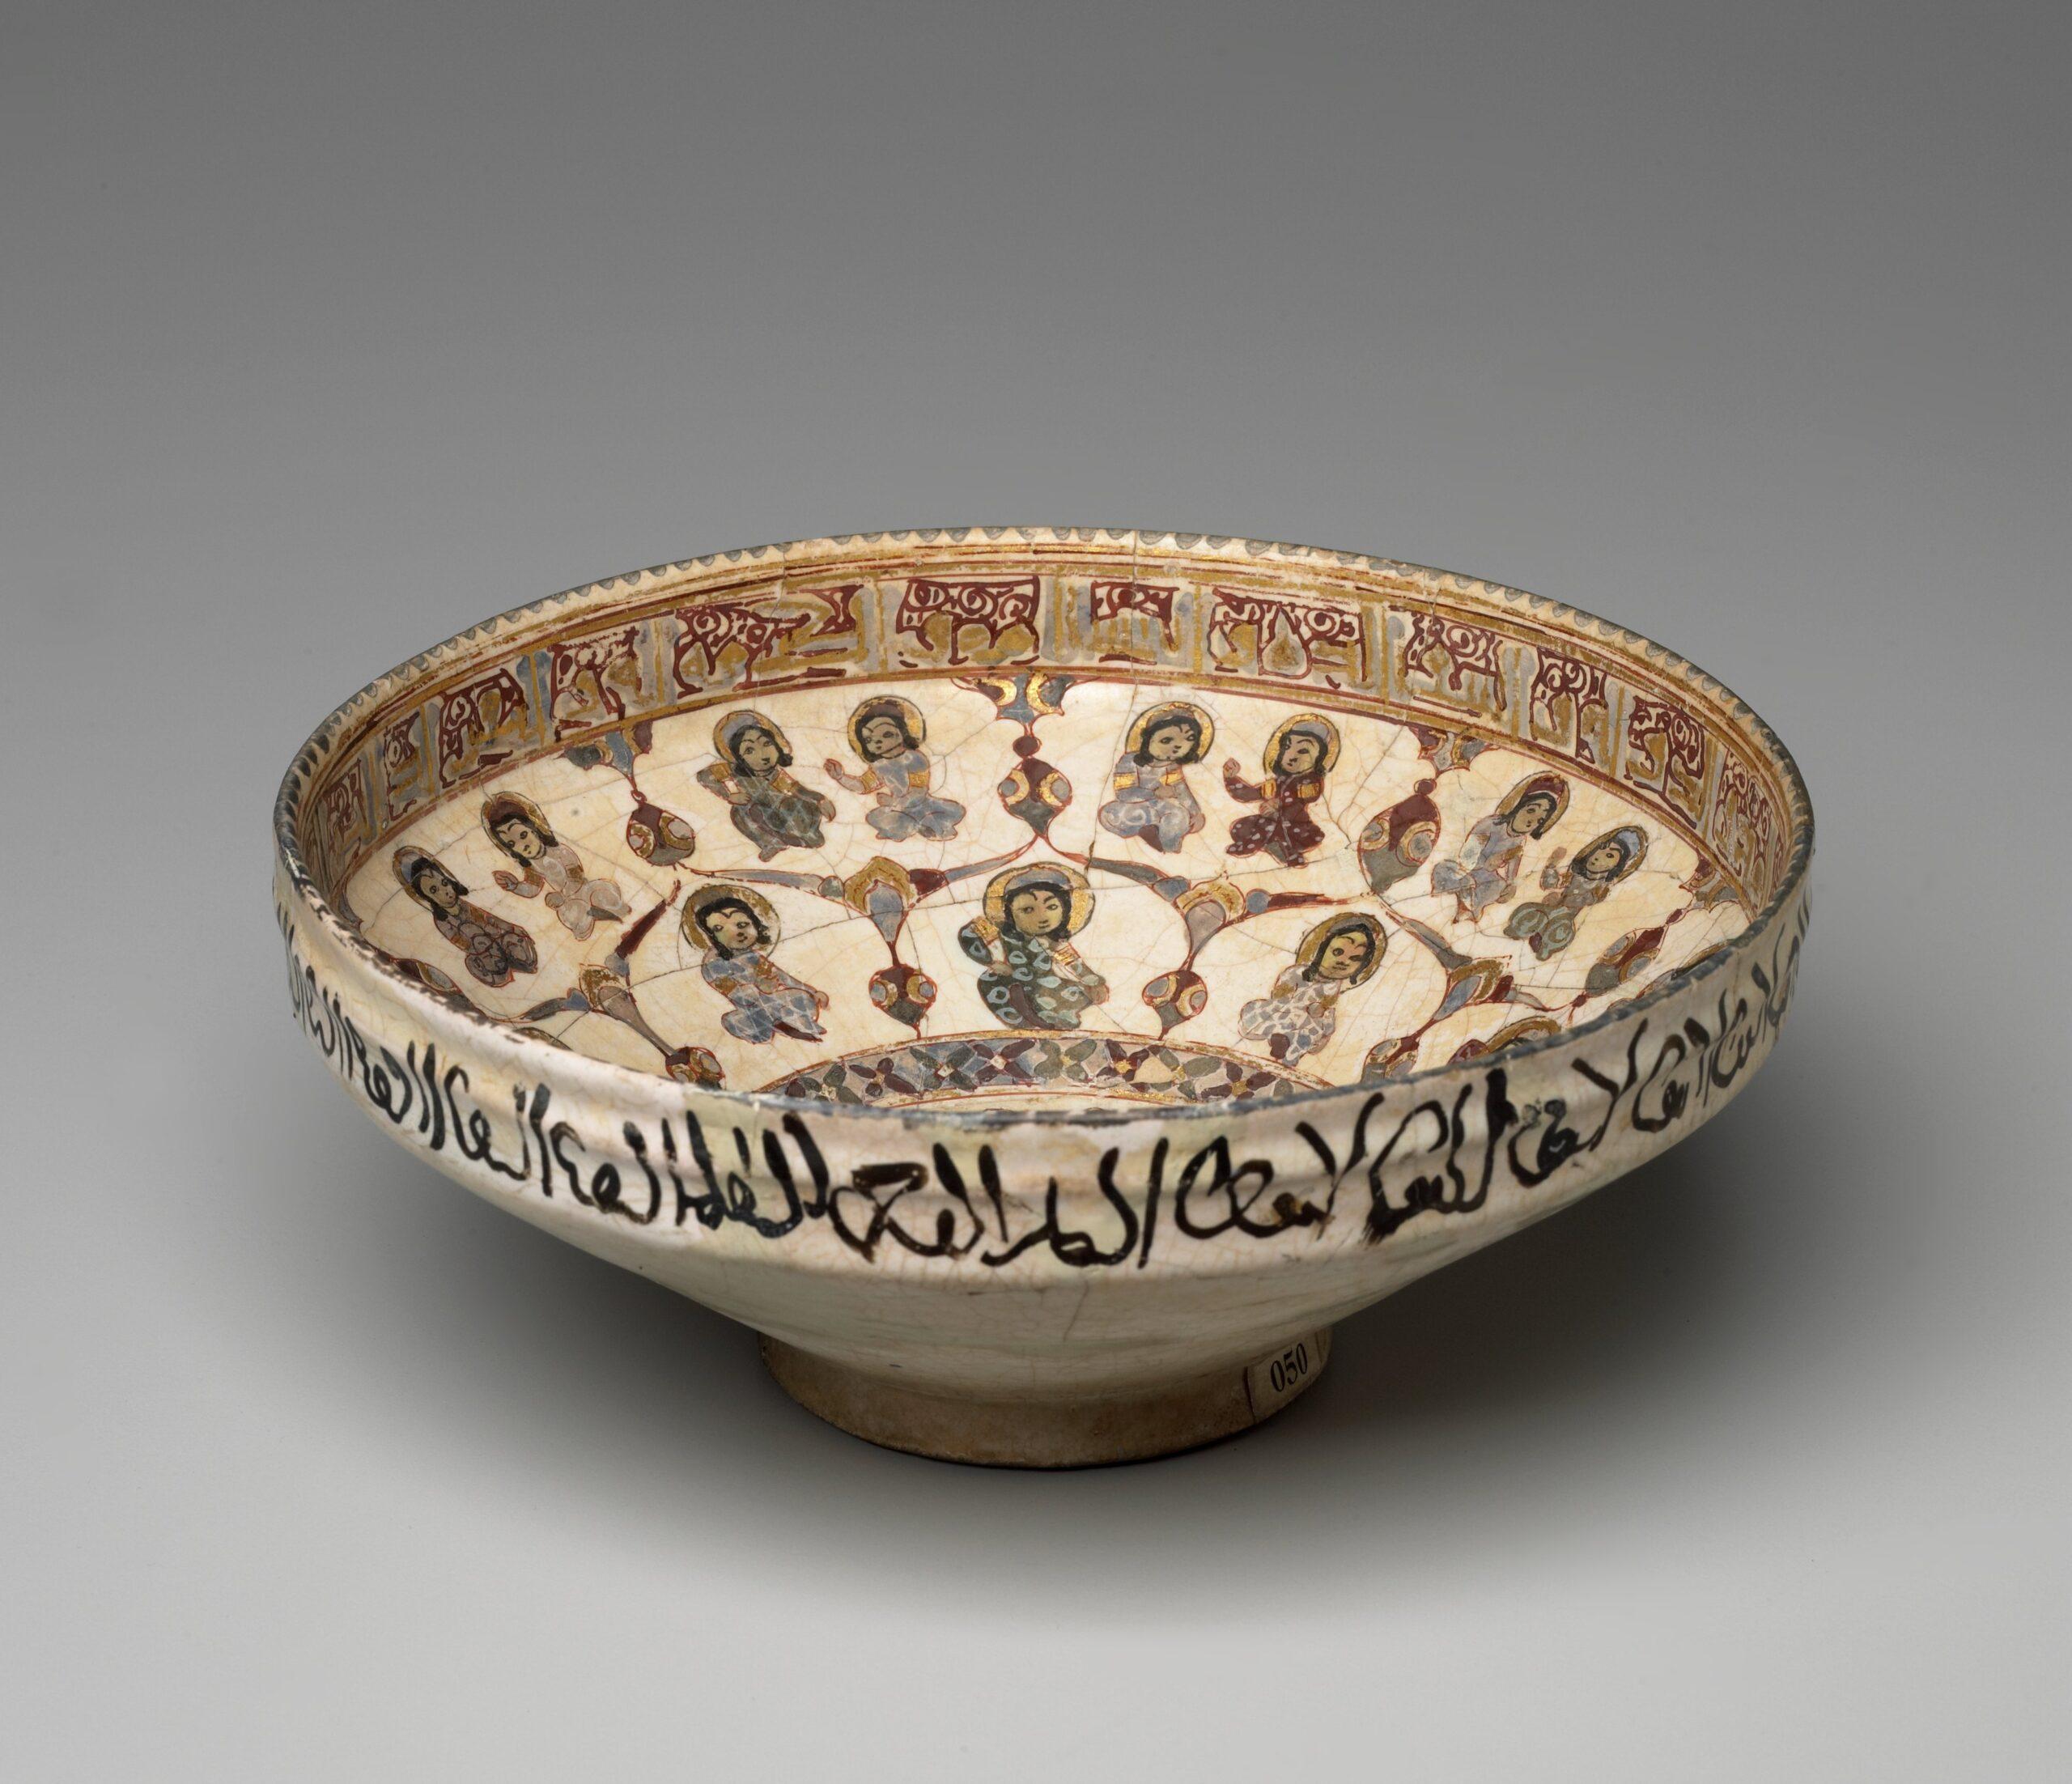 Bowl from Iran